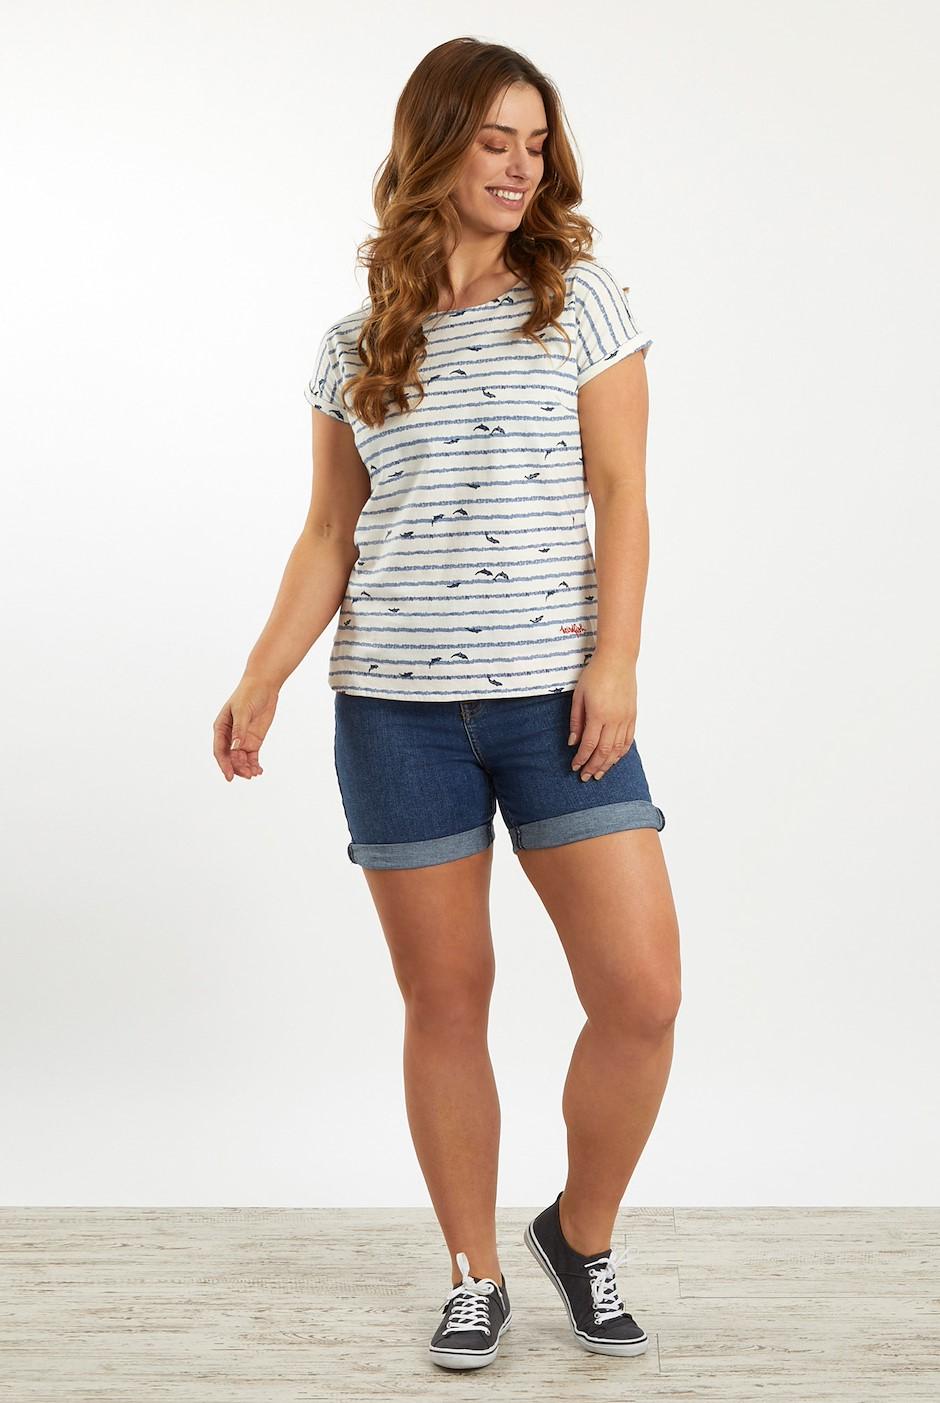 Paw Paw Patterned Jersey T-Shirt Light Cream